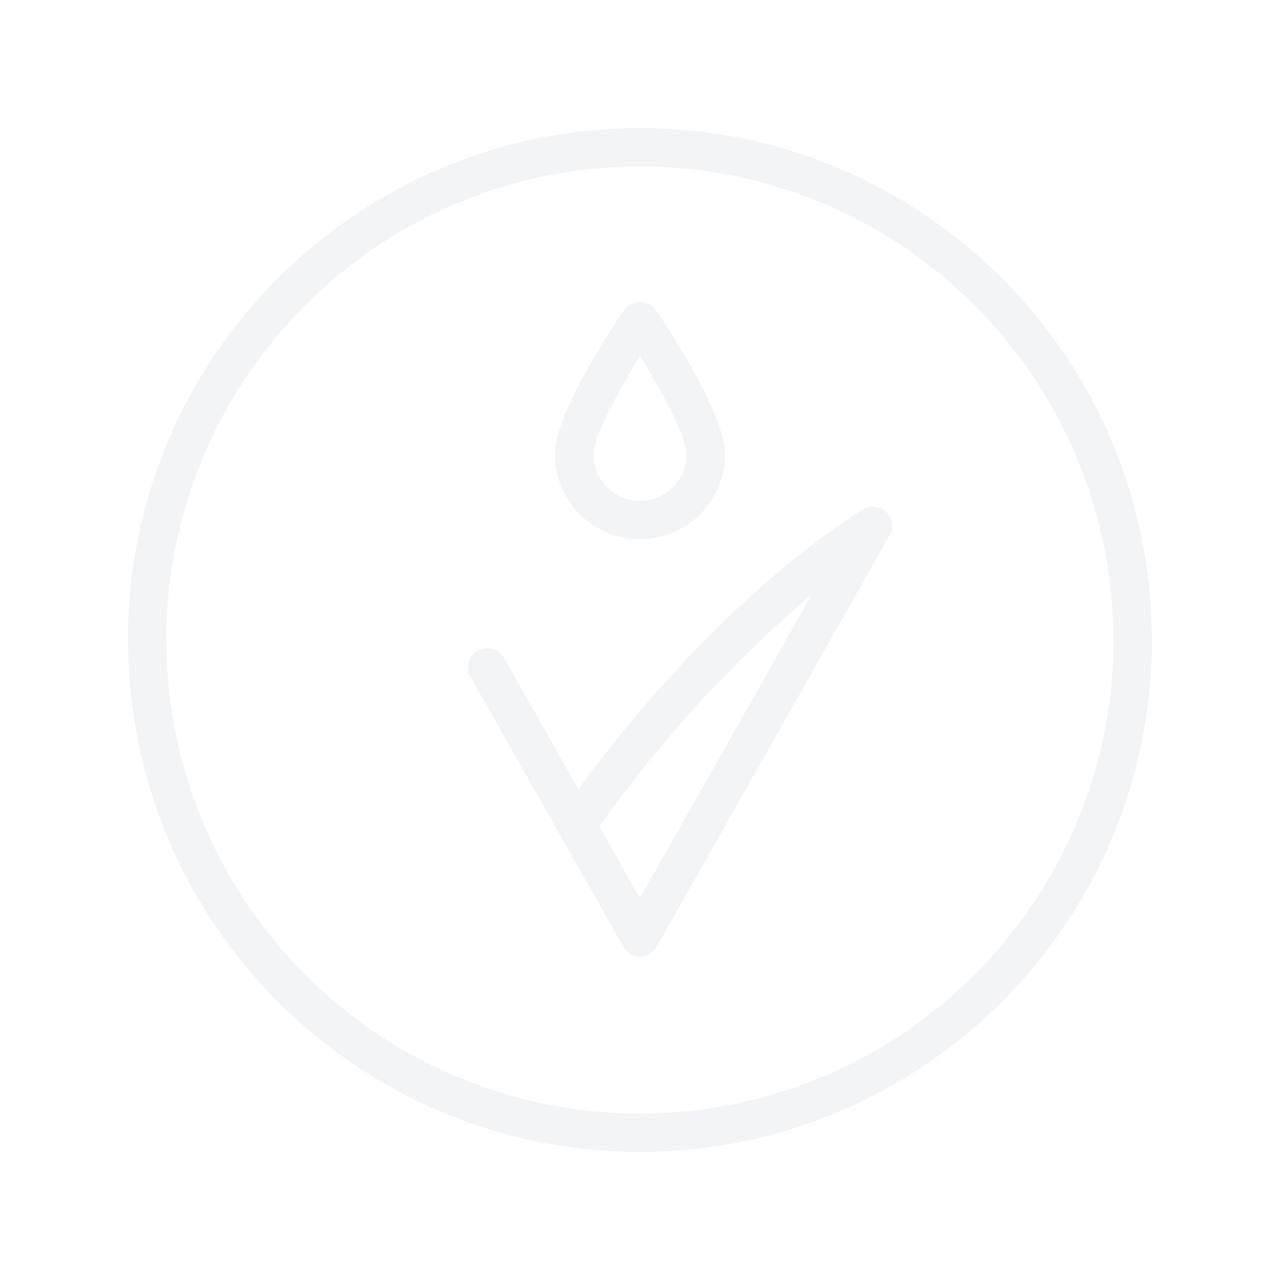 LA ROCHE-POSAY Kerium Extra Gentle Physiological Gel-Shampoo 400ml